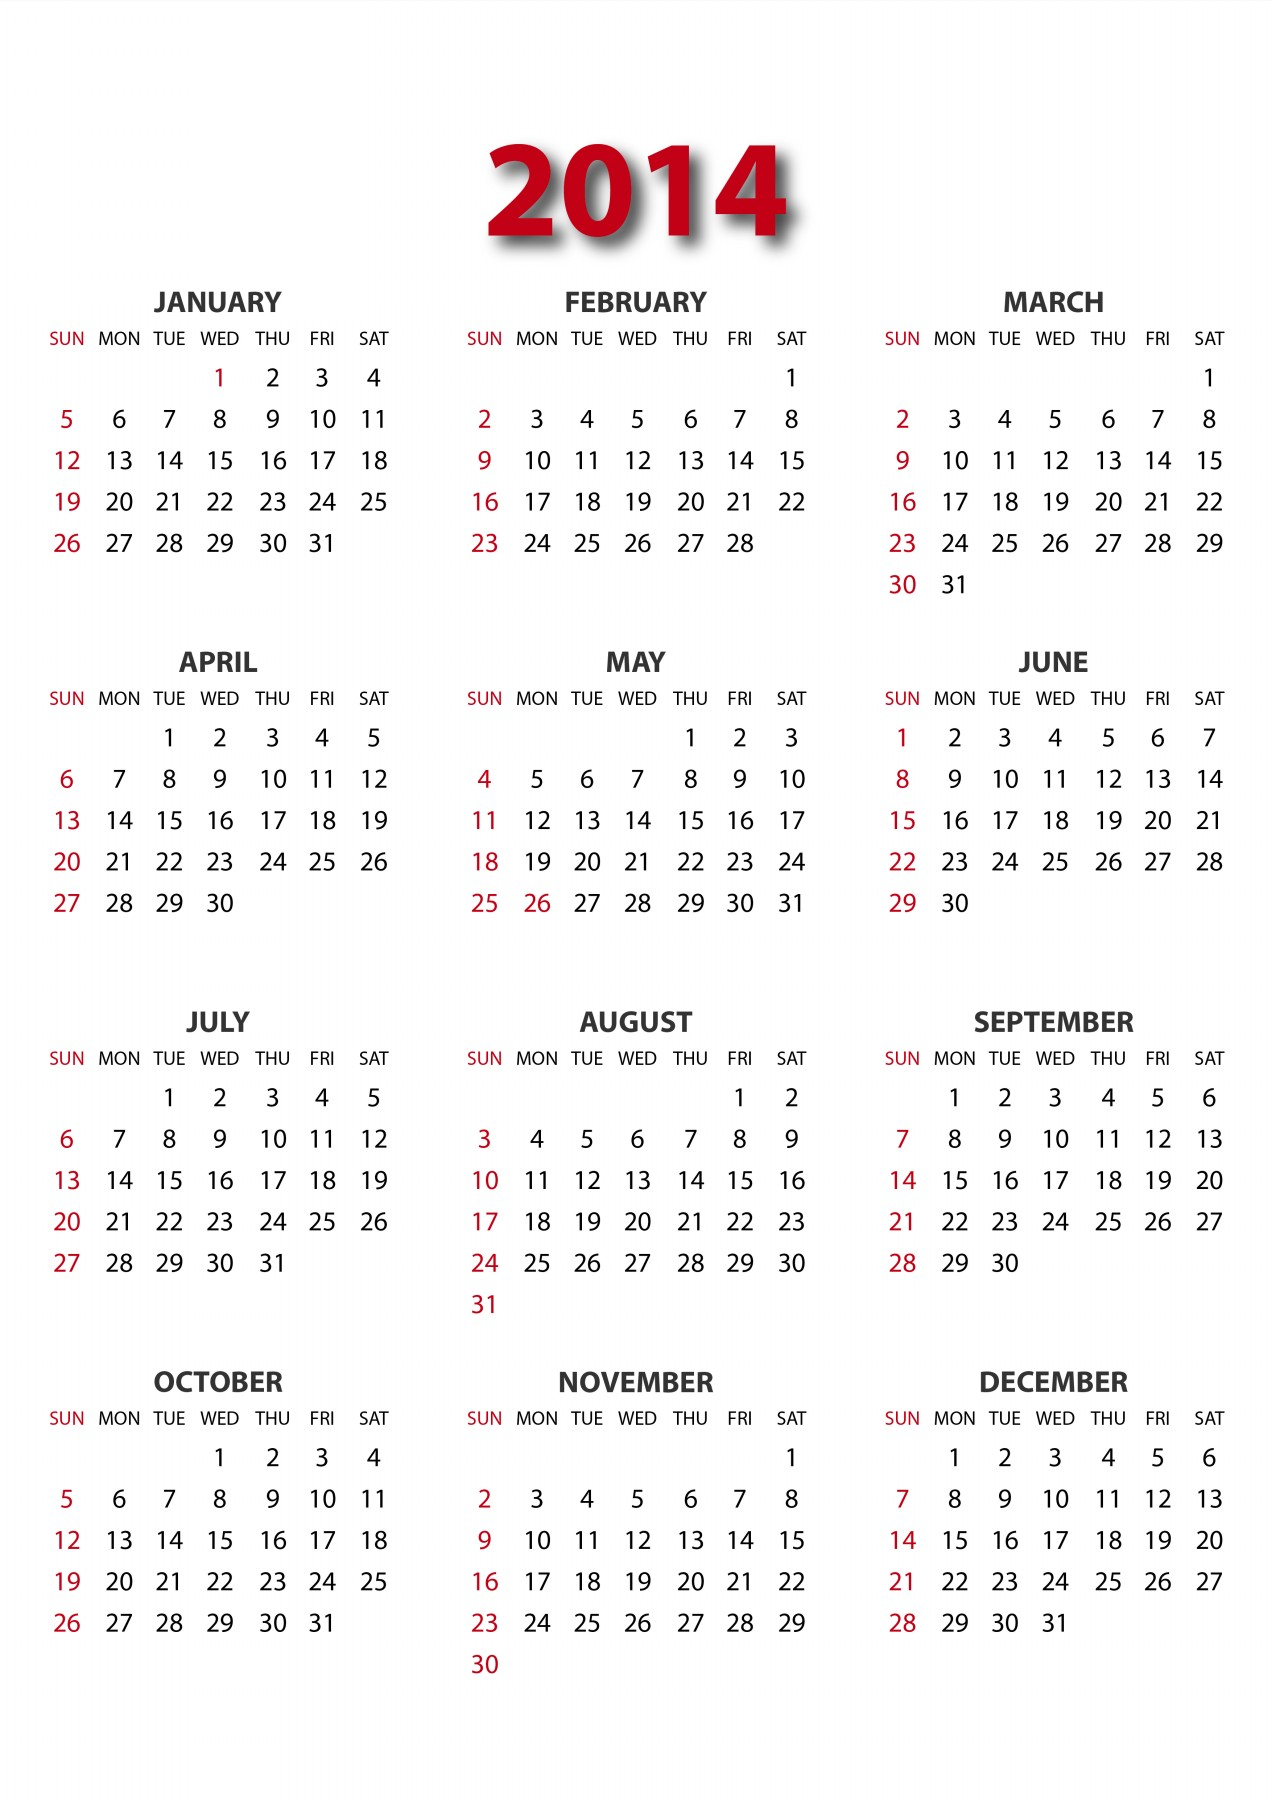 2014 Whole Year Calendar. 2014 Calendar Printable One Page W Holidays ...